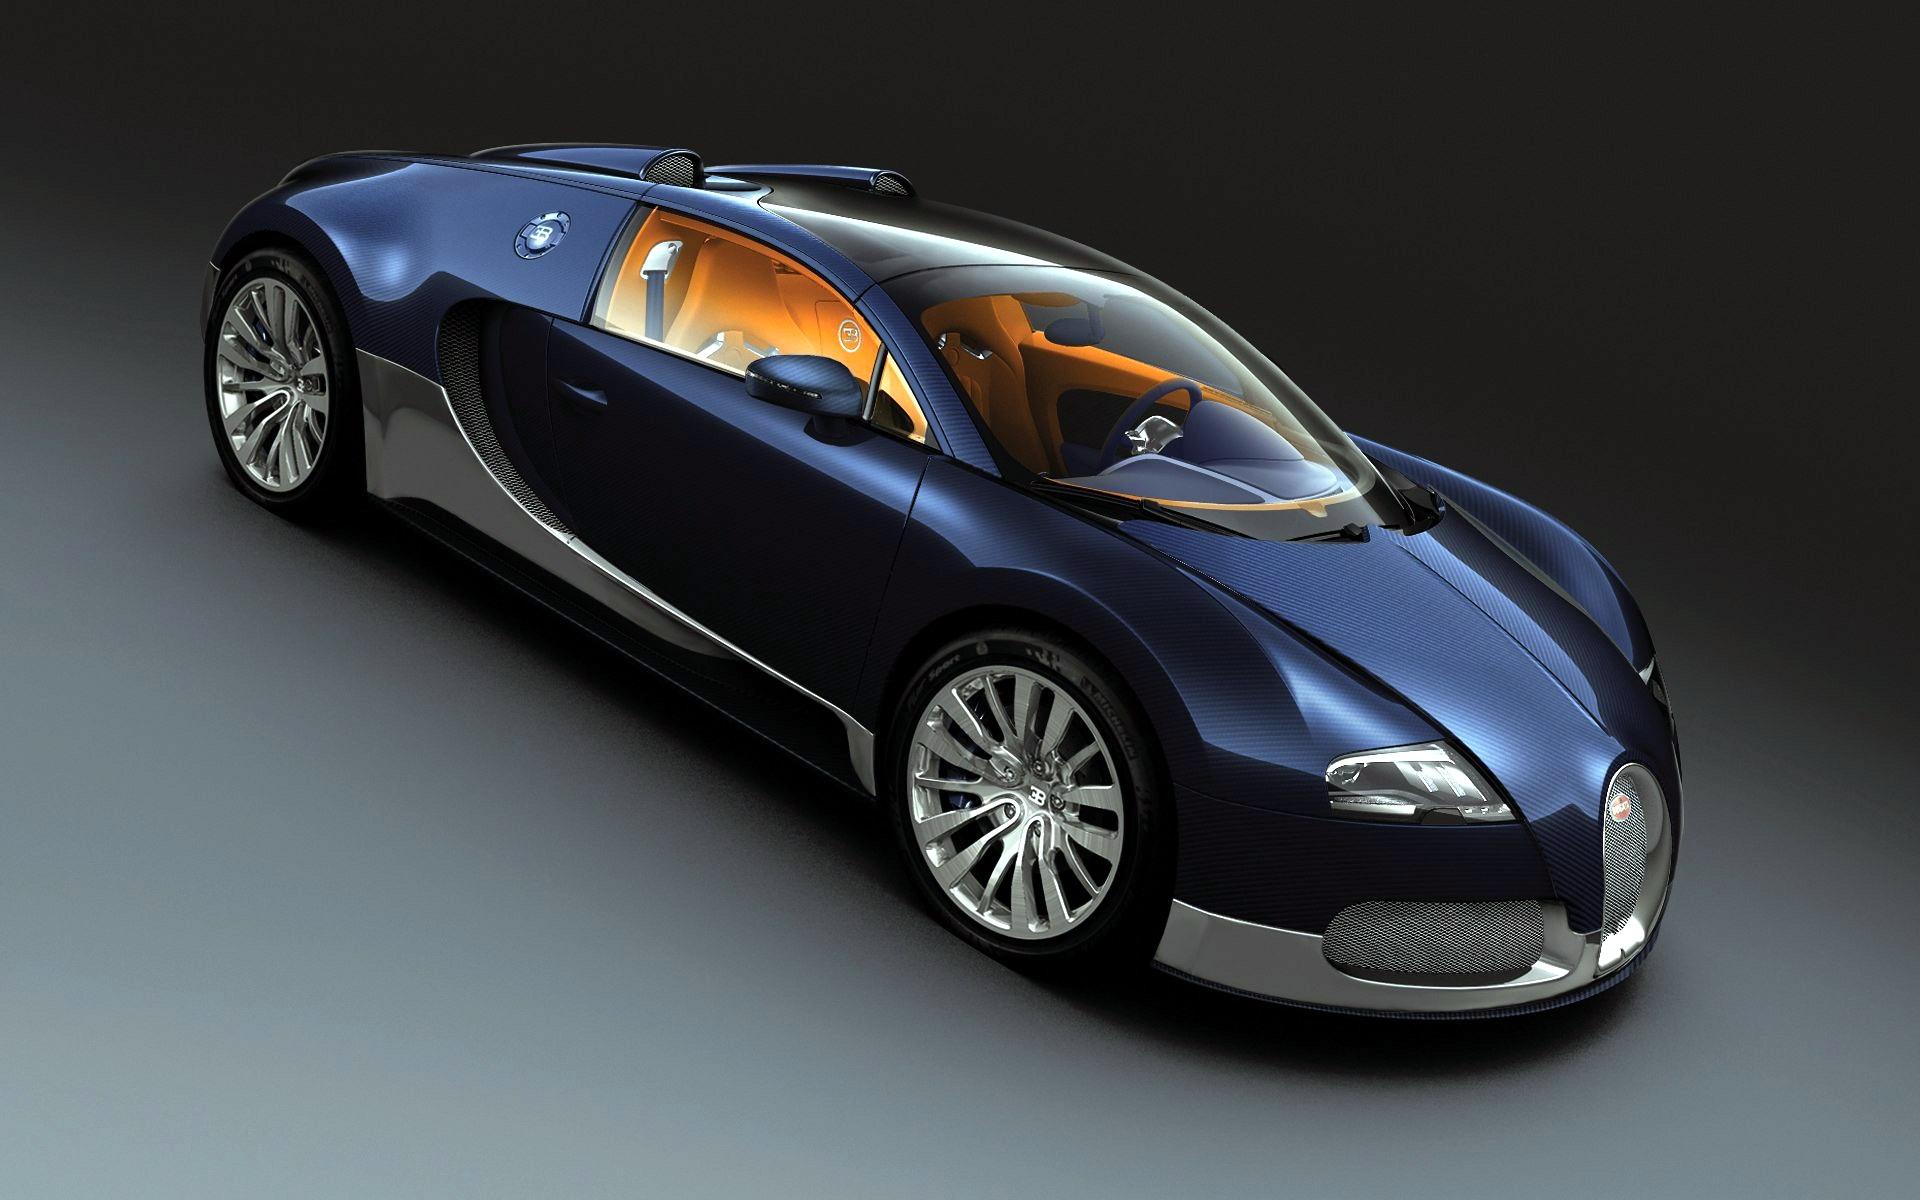 Bugatti Veyron Grand Sport 2011 Wallpaper HD Car Wallpapers 1920x1200